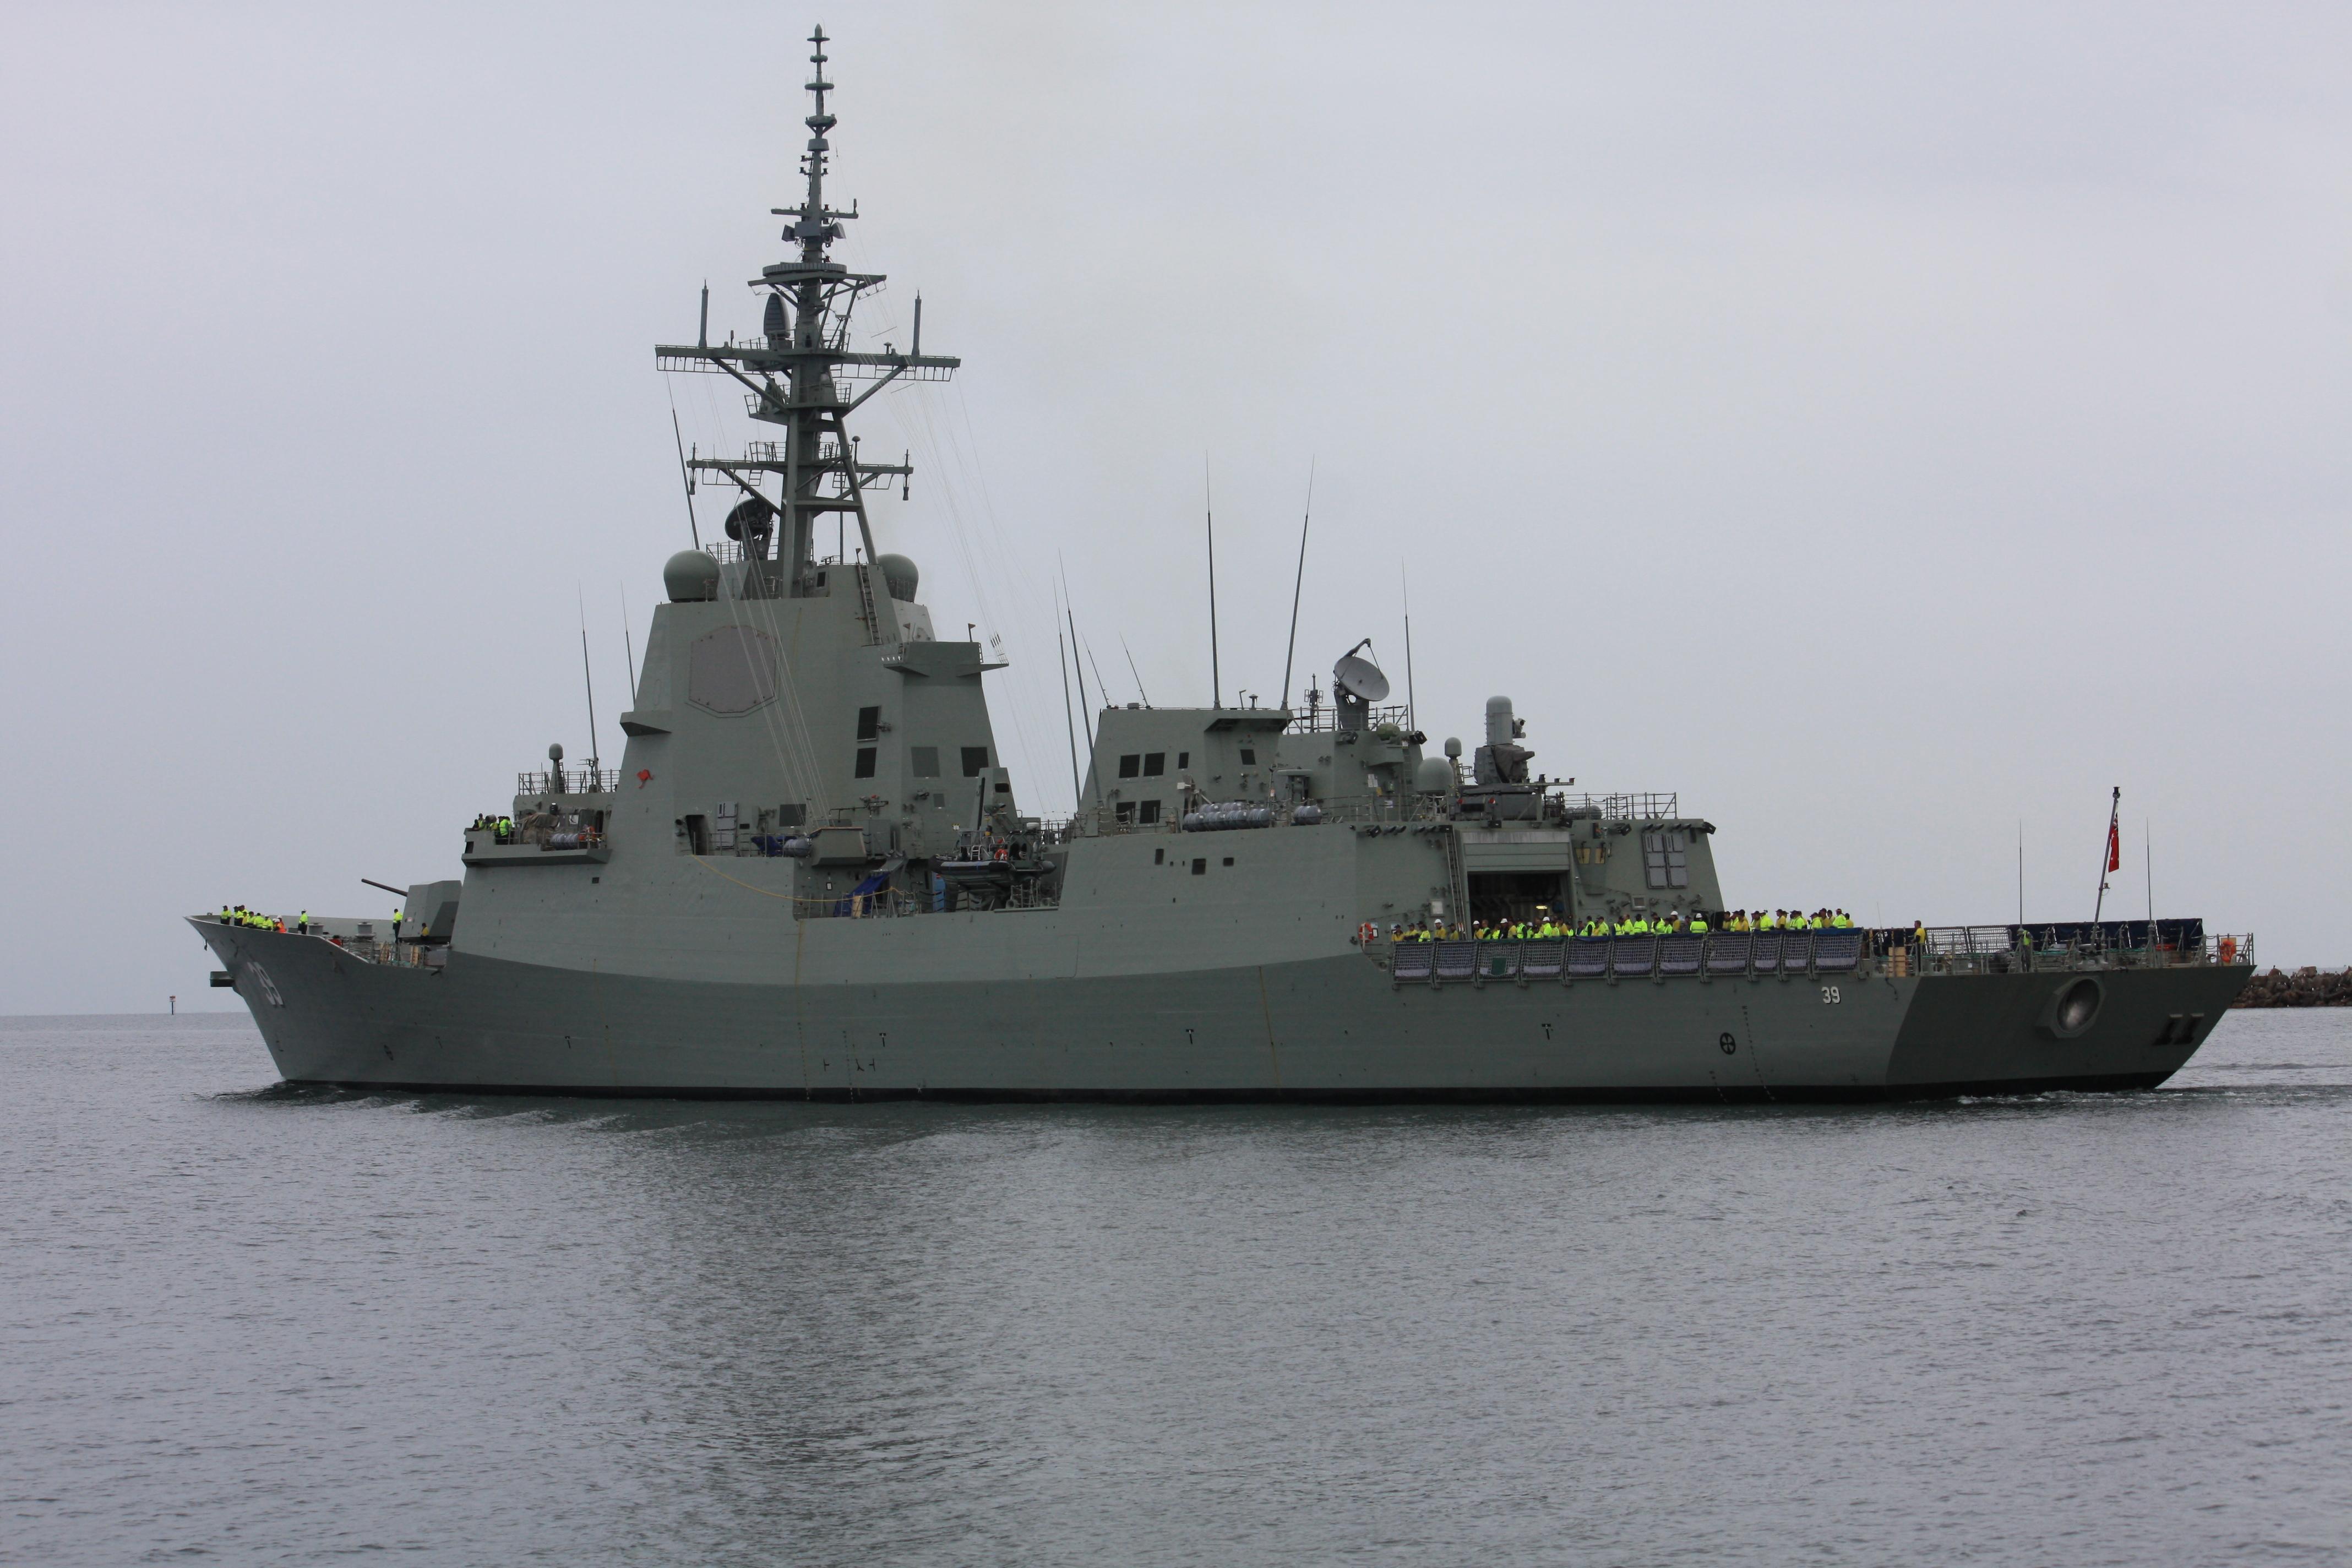 Australian Navy - Marine Australienne - Page 4 29000959503_b657bdddab_o